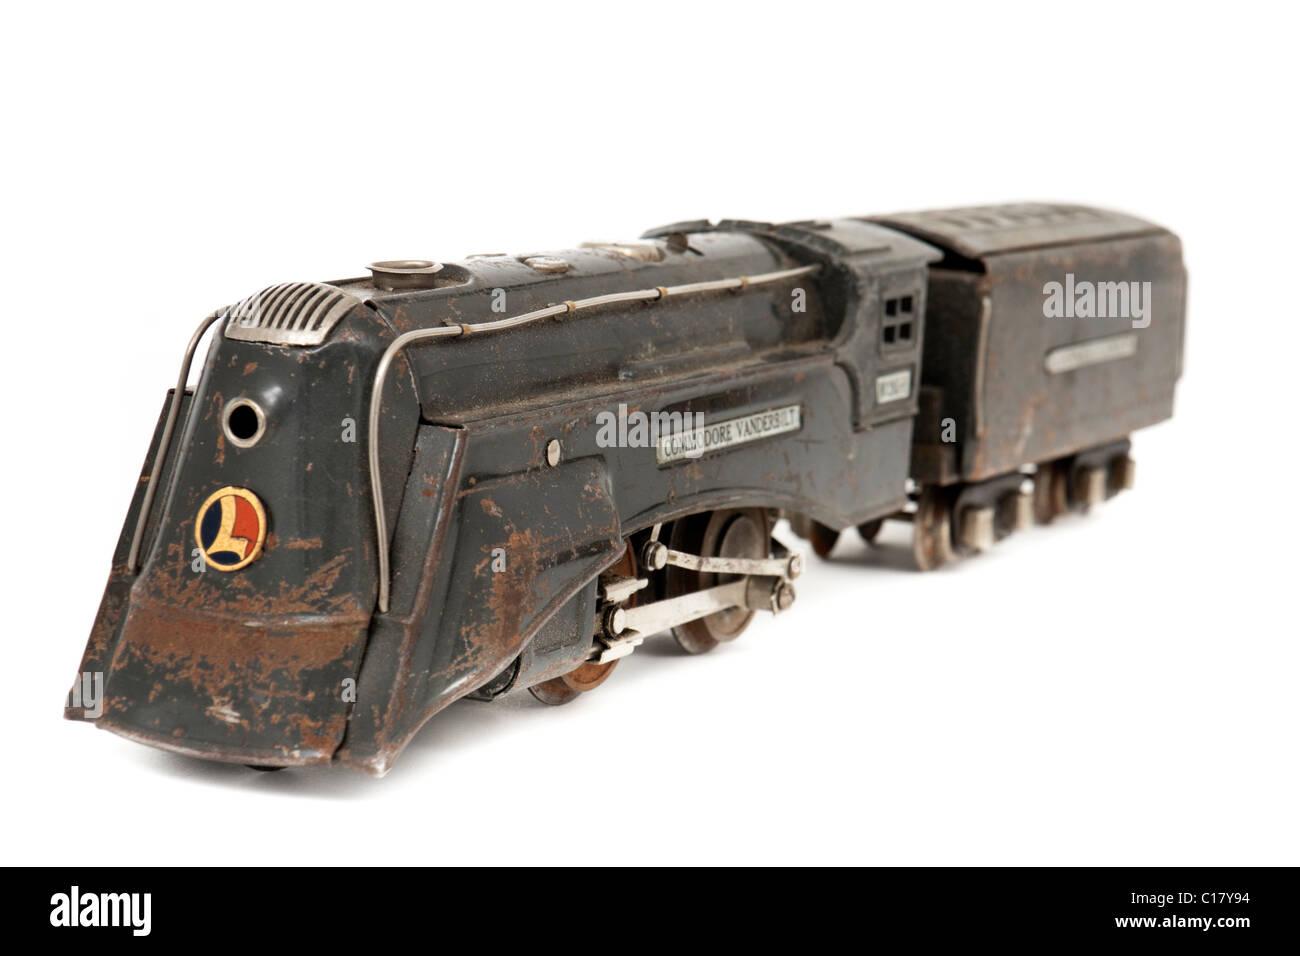 1935 Lionel 'Commodore Vanderbilt No 265-E' model railway locomotive with tender (O-gauge, 3-rail) - Stock Image